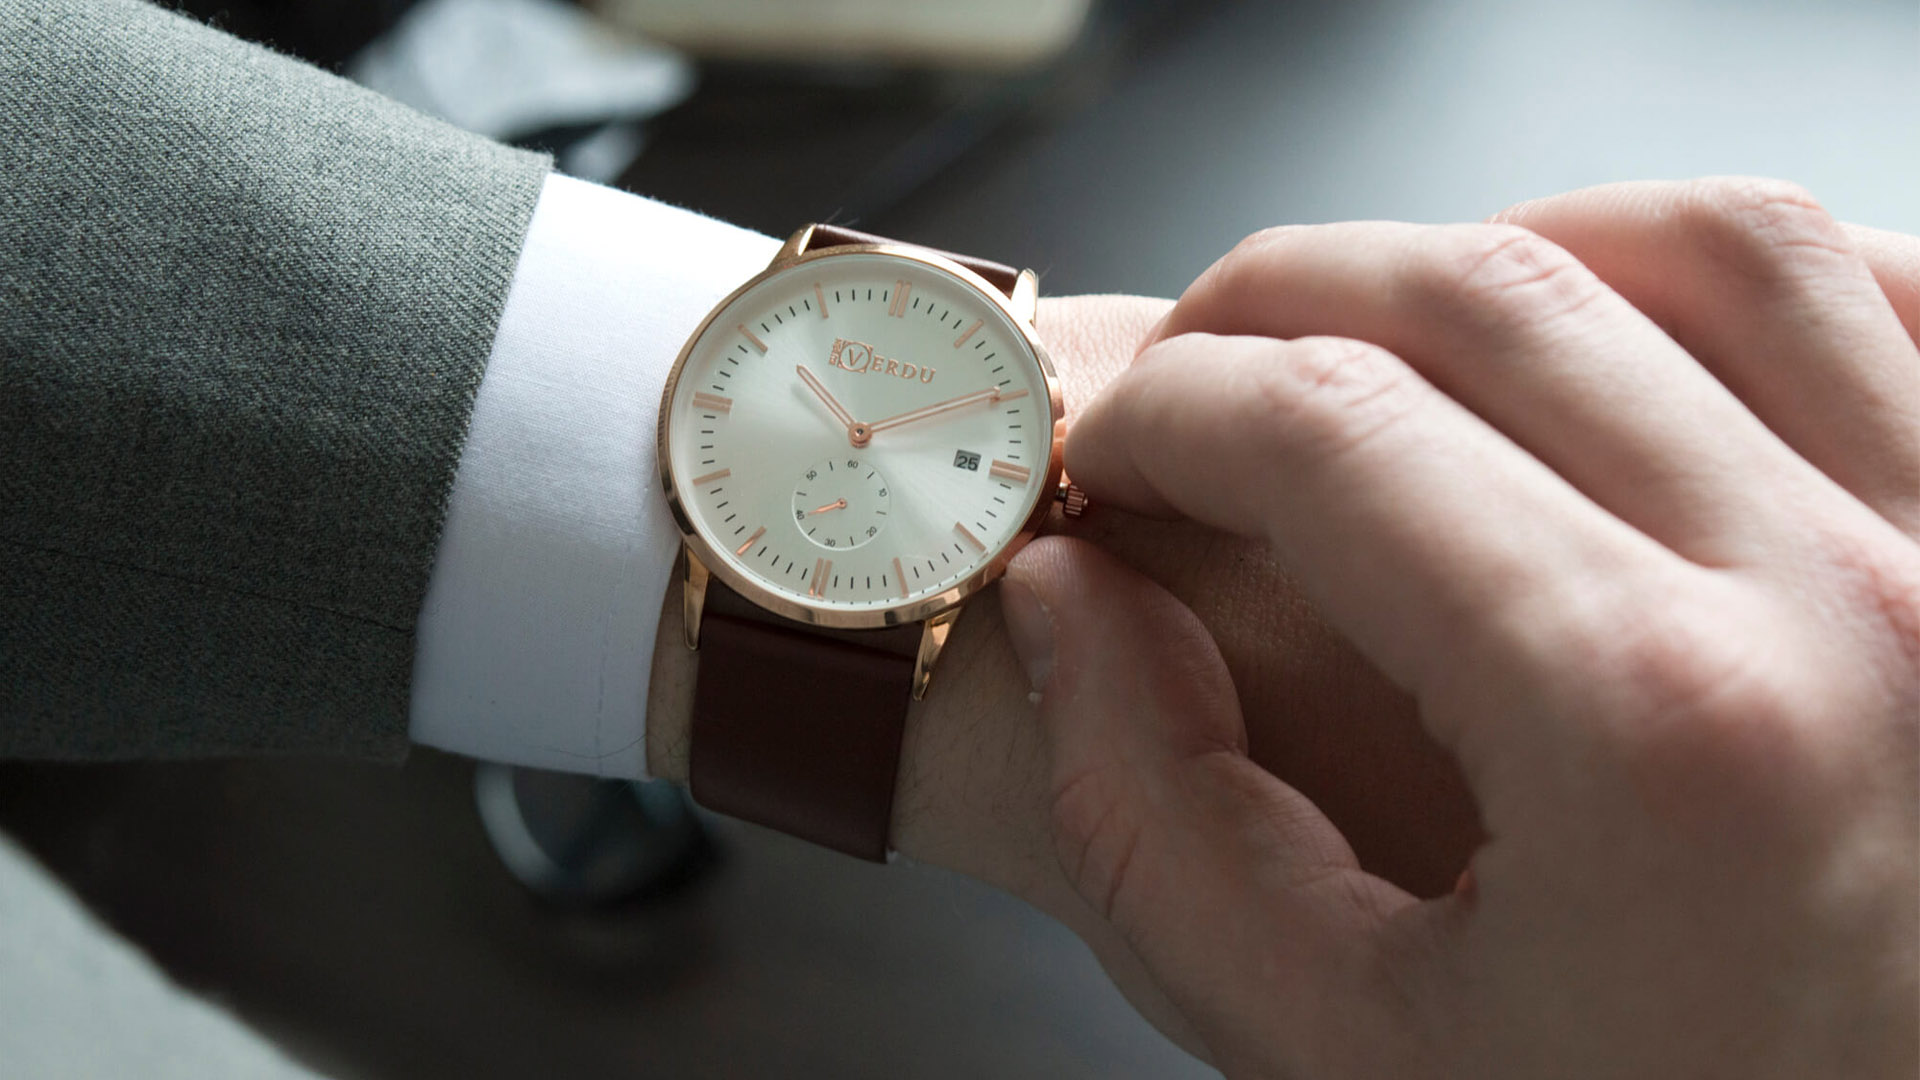 personalizowany zegarek.jpg